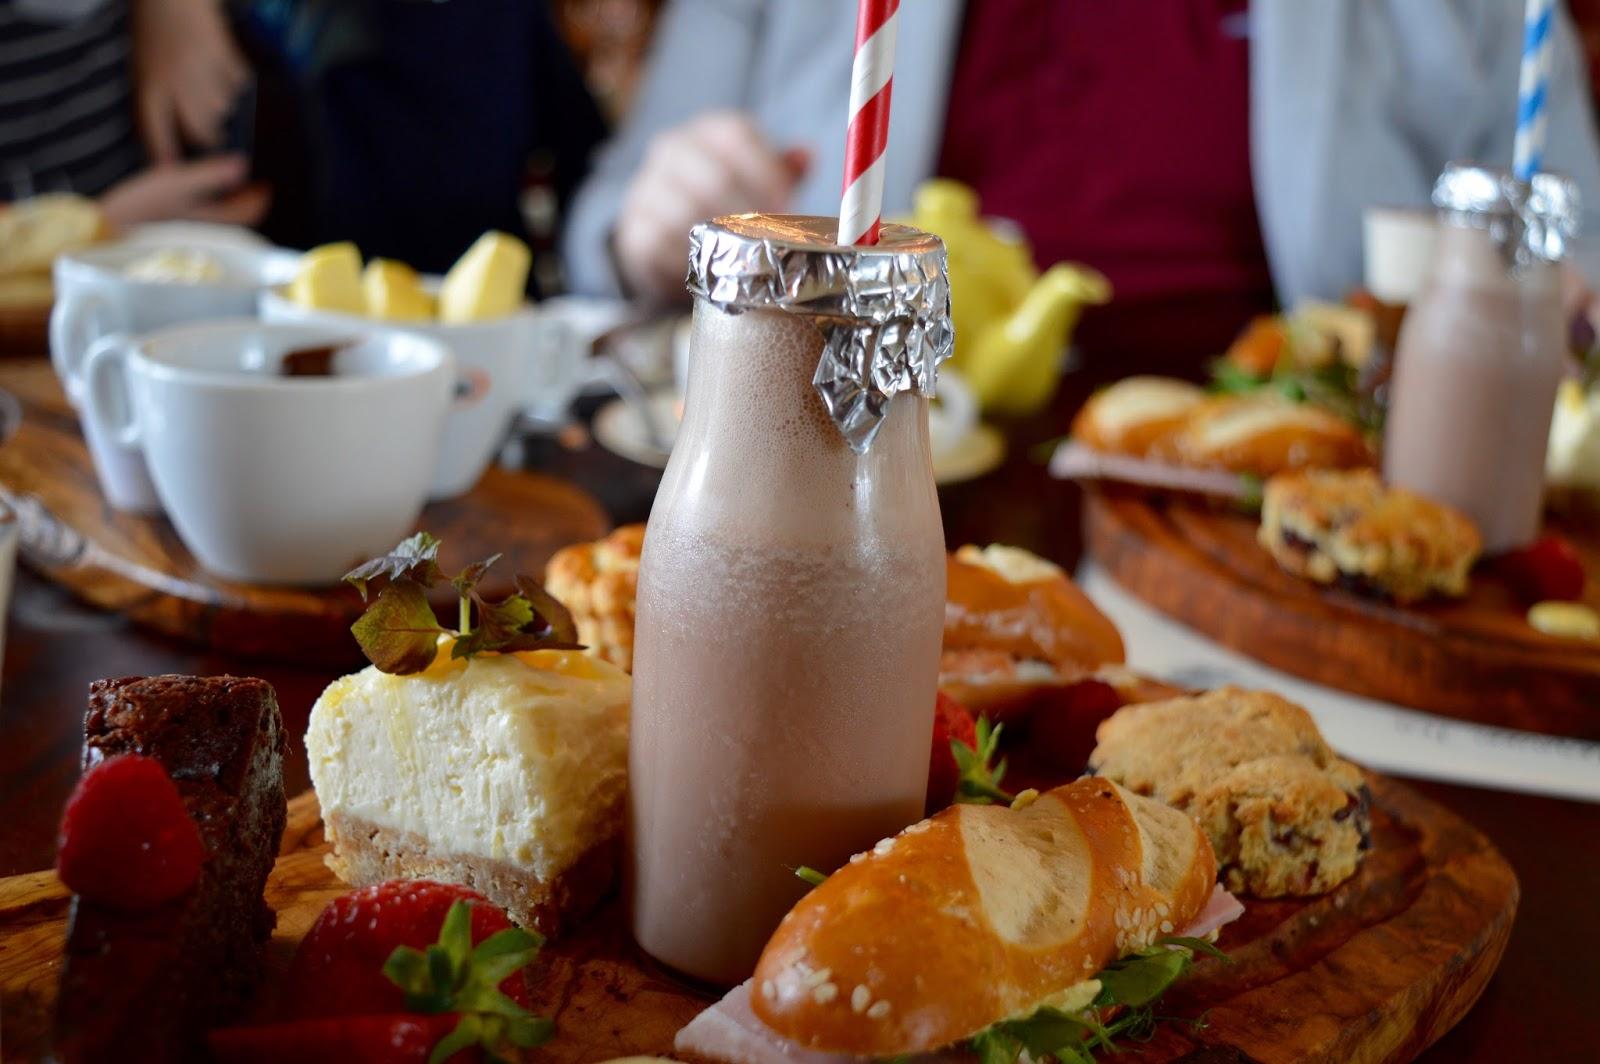 Italian style afternoon tea at Sorella Sorella in Gateshead